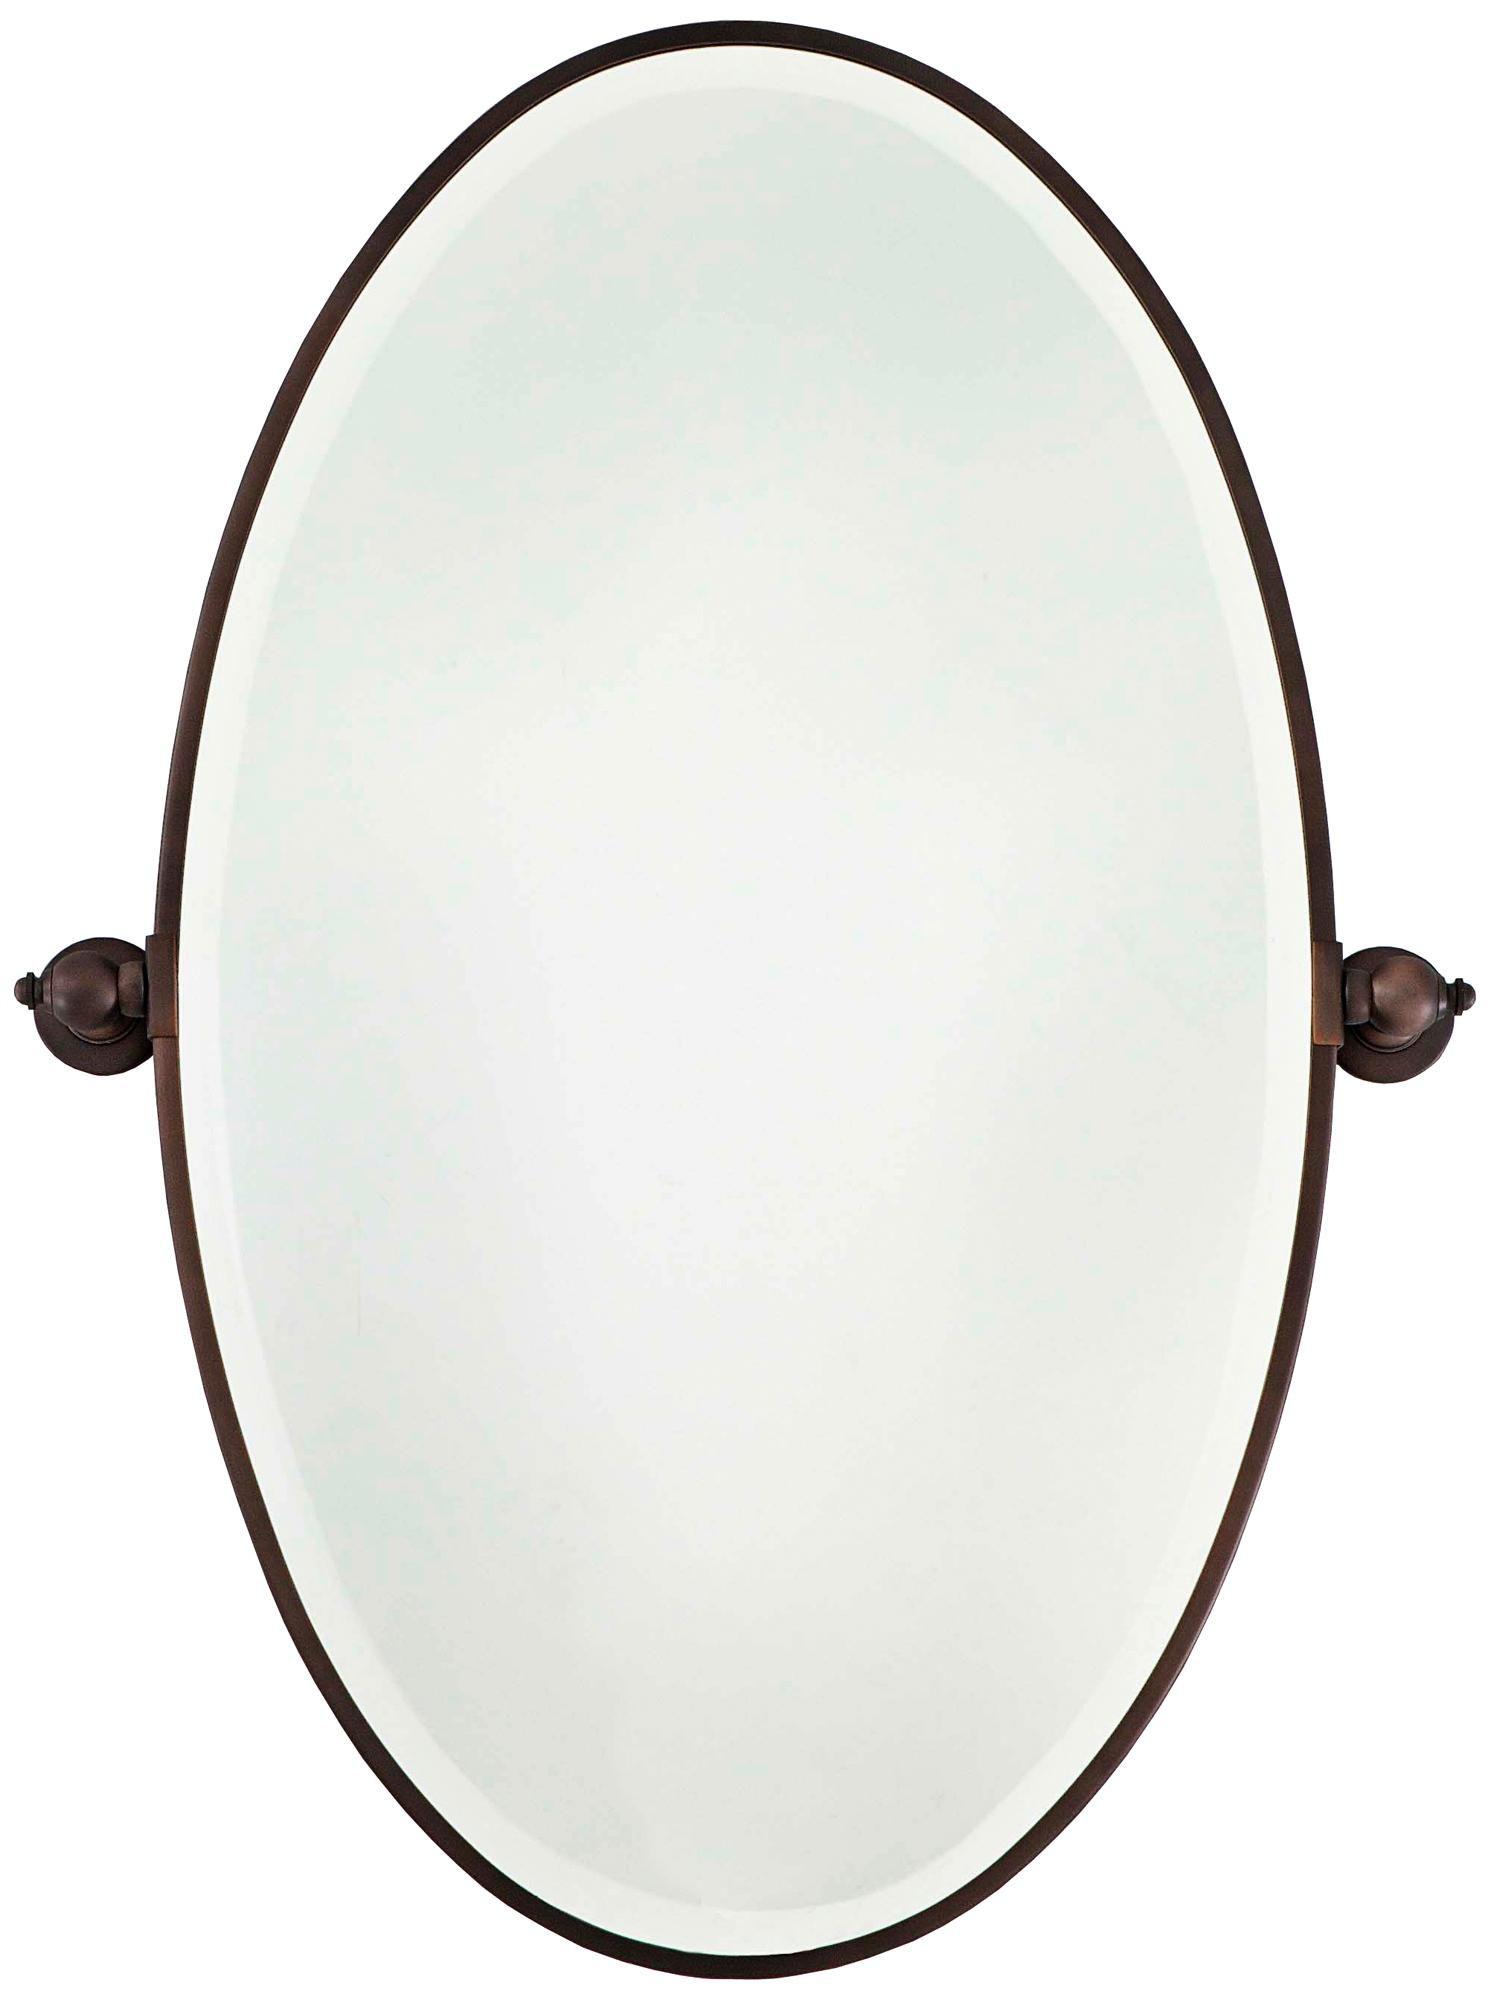 Minka 36 High Oval Brushed Bronze Bathroom Wall Mirror U8973 Lamps Plus Mirror Wall Bathroom Bronze Bathroom Traditional Bathroom Mirrors [ 2000 x 1491 Pixel ]